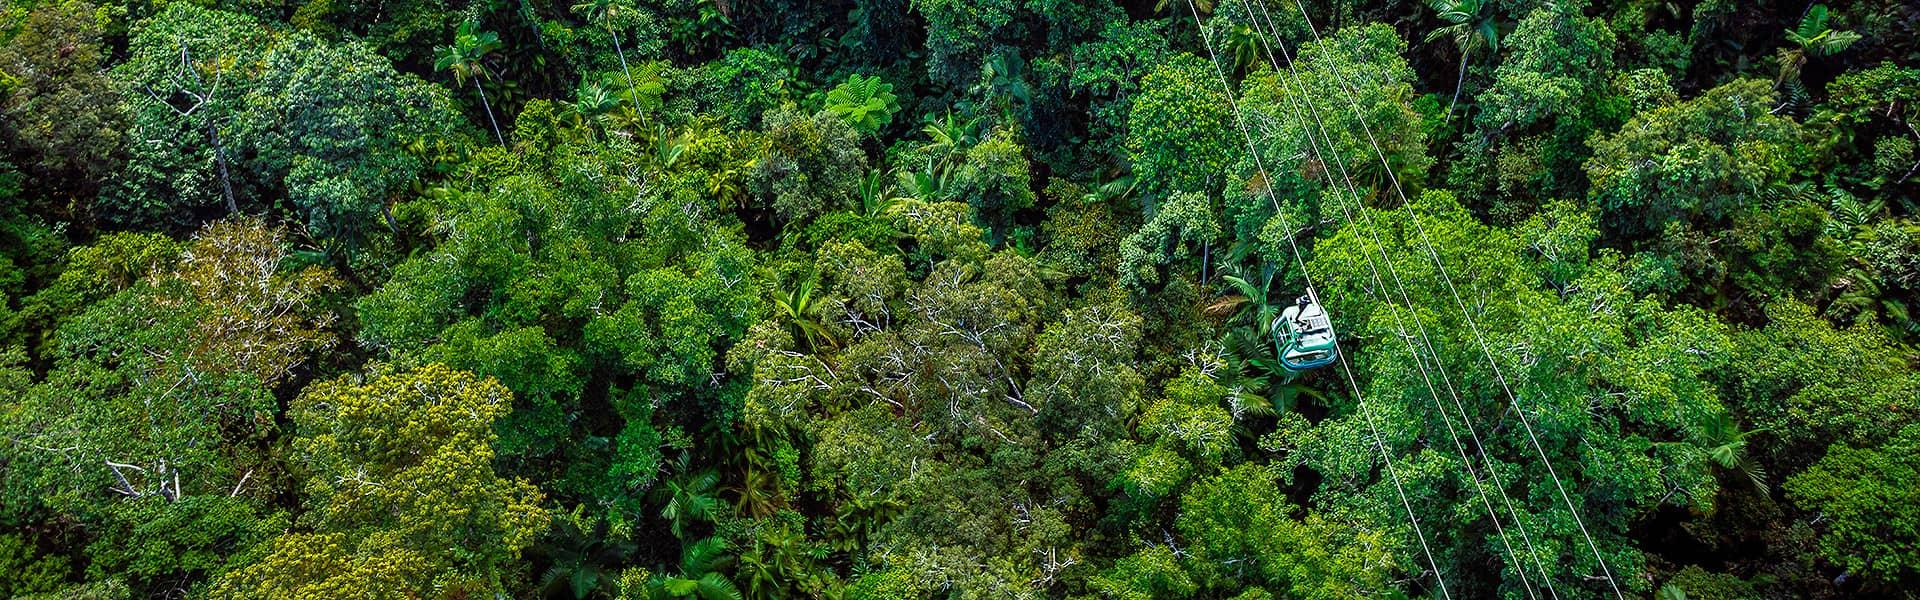 Cairns Reef, Rainforest, Kuranda, Harbour Cruise Accommodated Tours